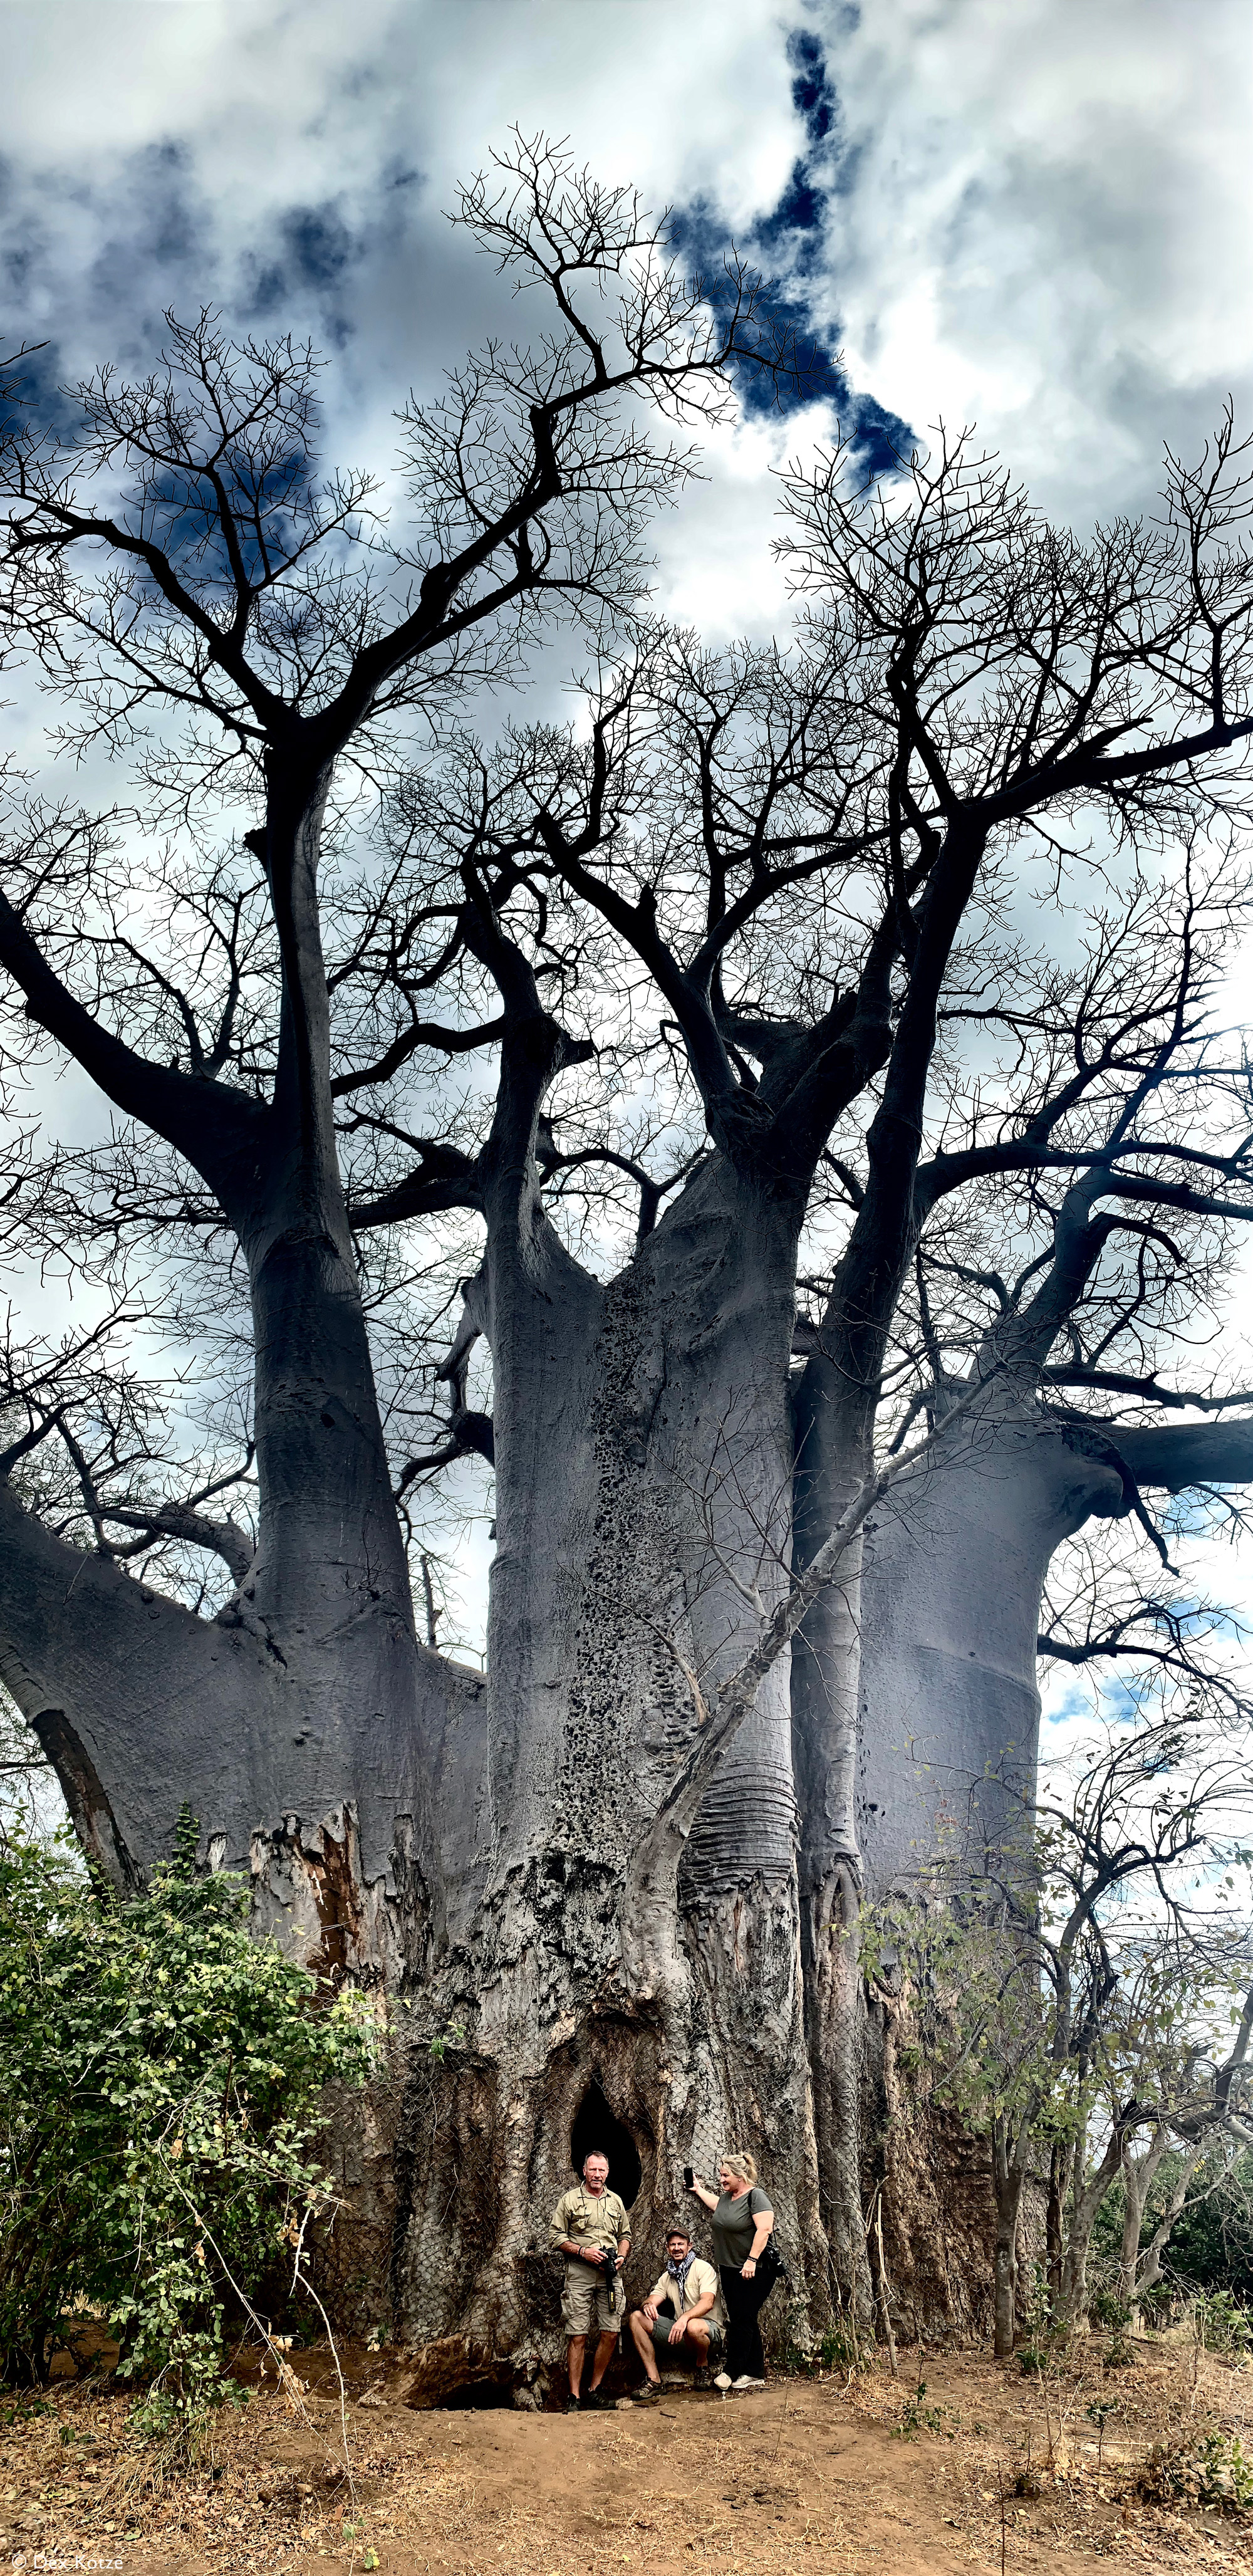 Shadreck's Office, baobab tree